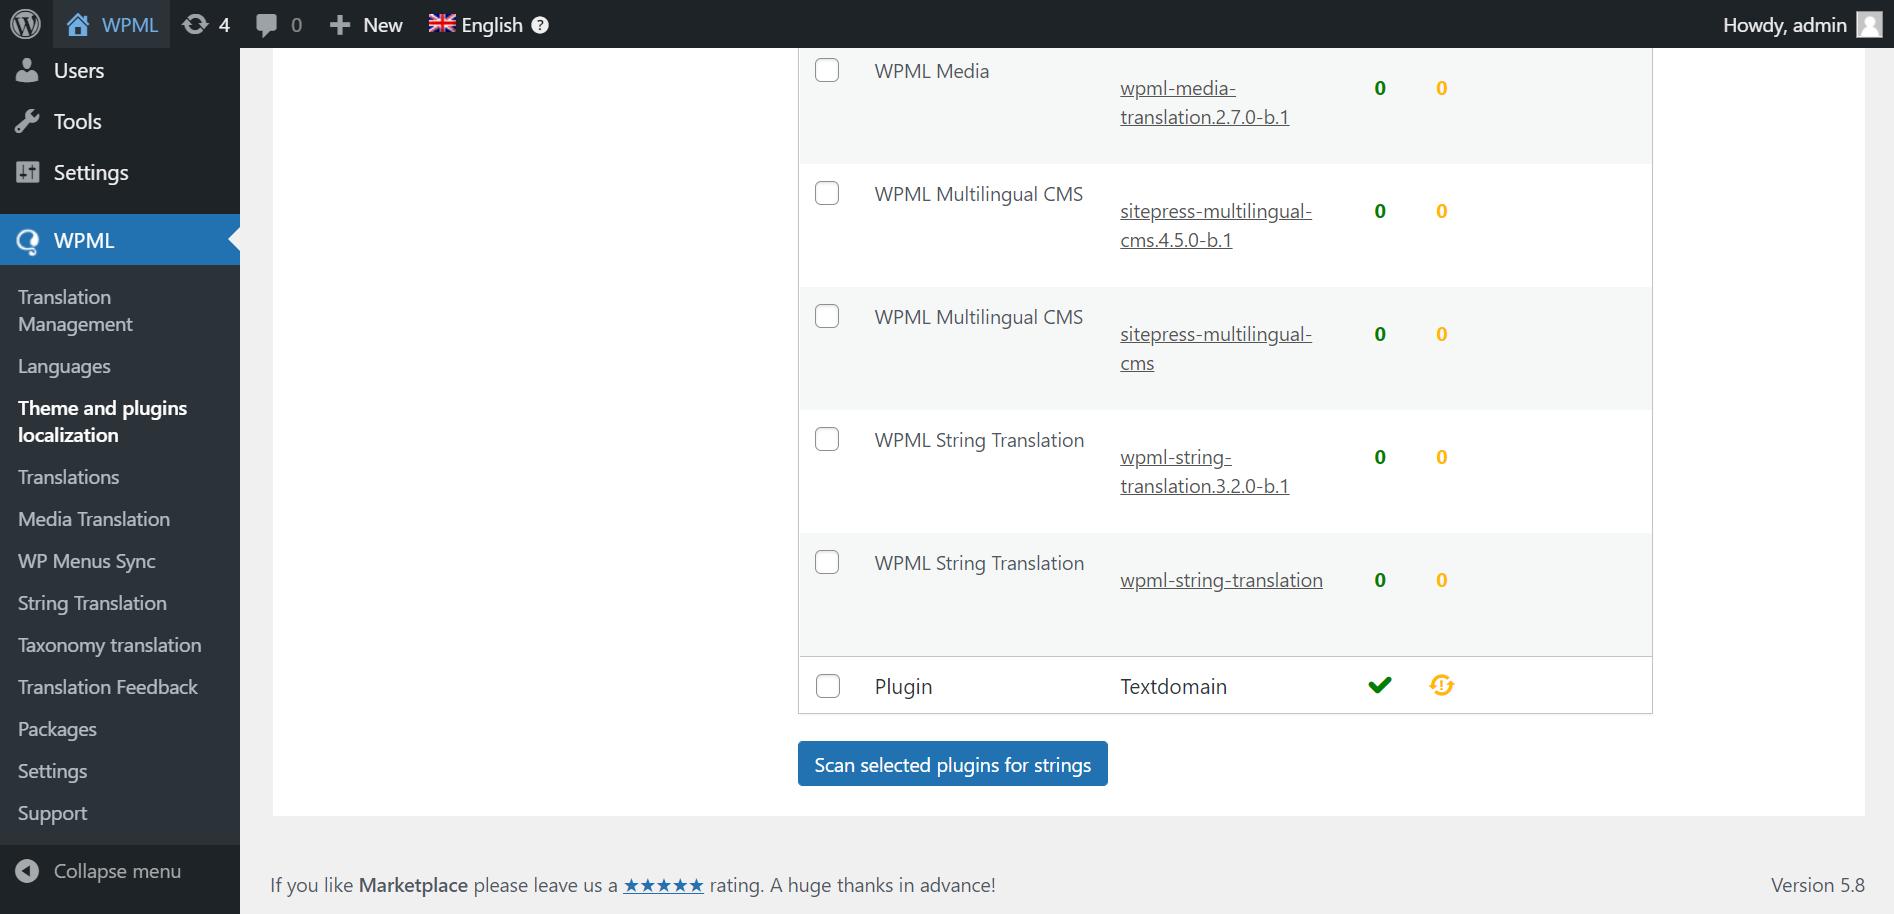 Theme-and-plugins-localization--WPML-1